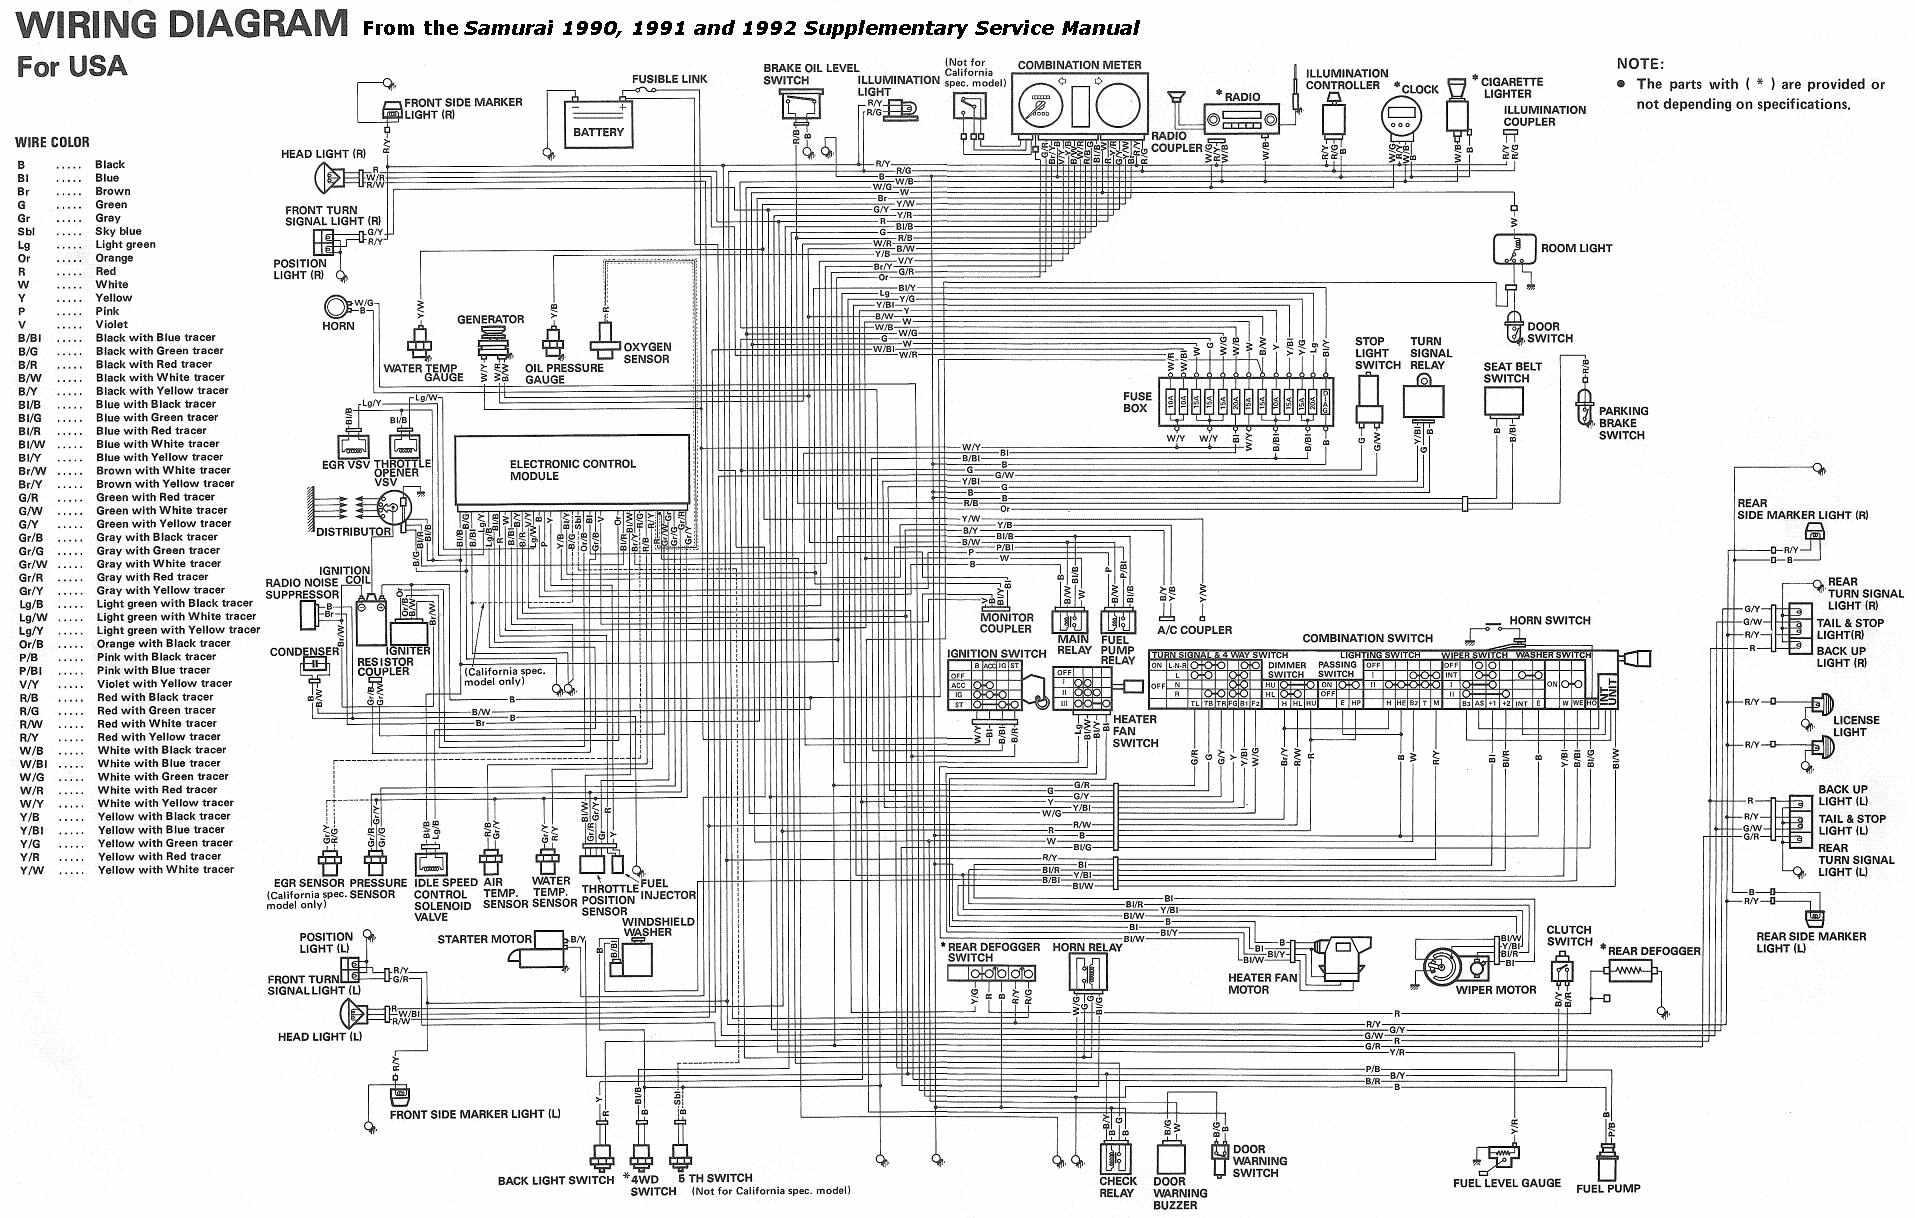 Suzuki Car Pdf Manual Wiring Diagram